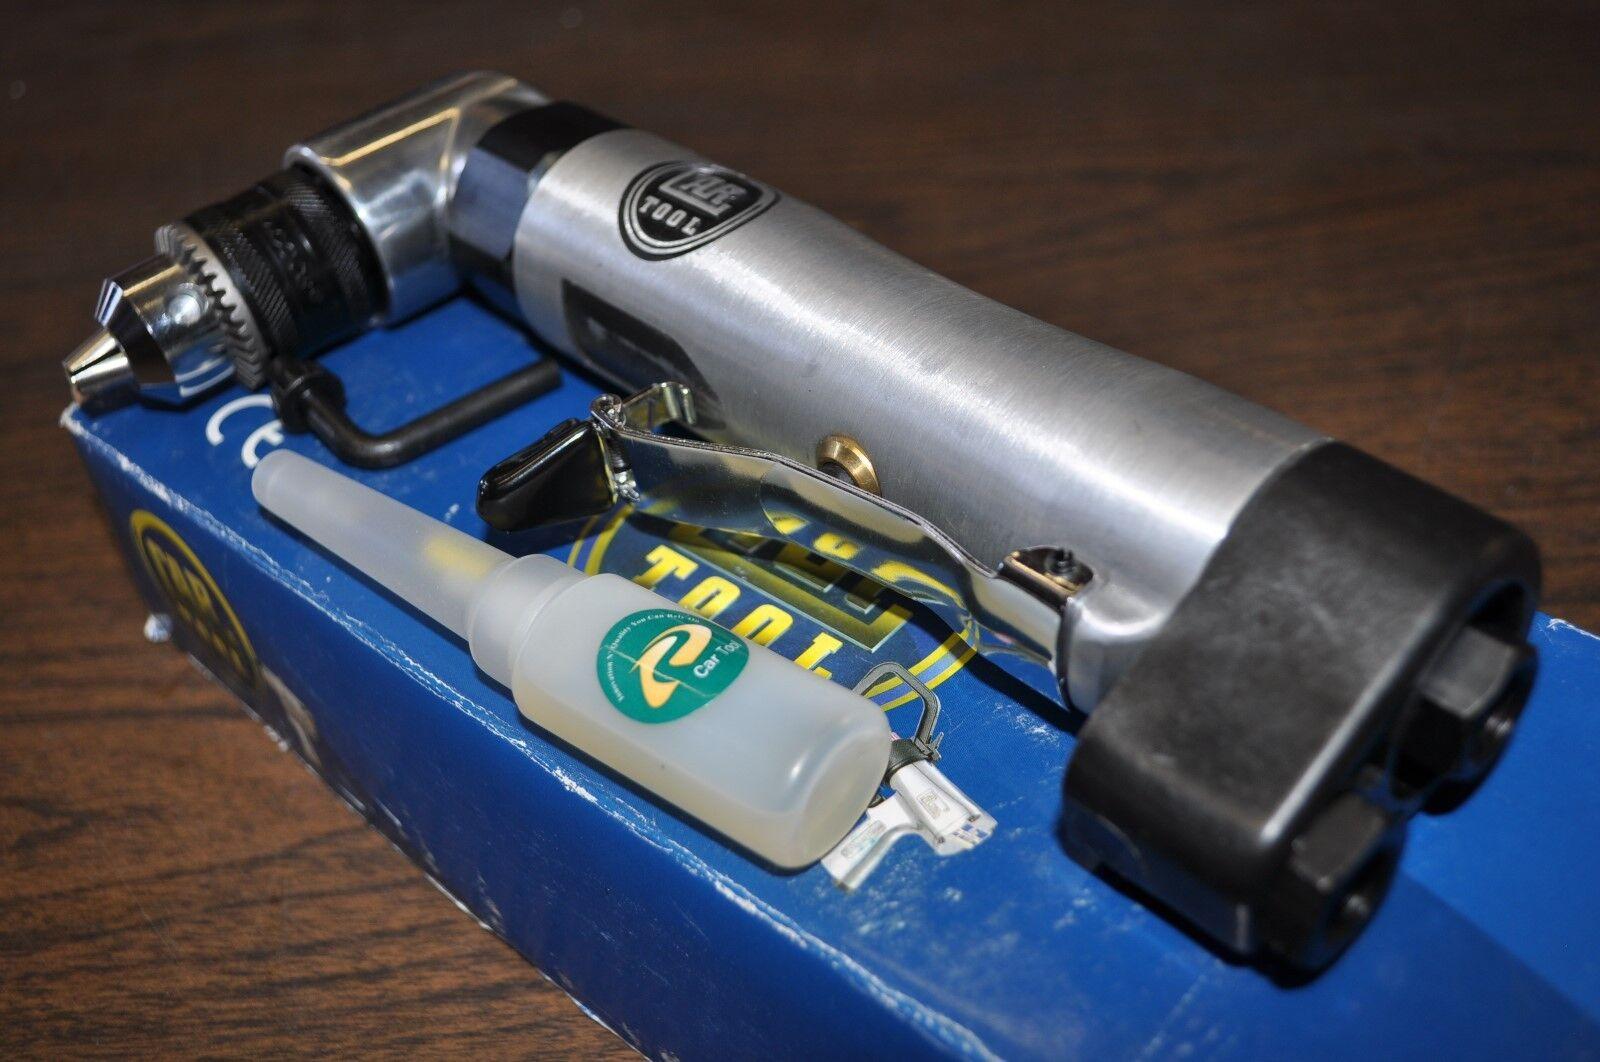 3 8  Air Angle Drill 1,900 RPM-Vacula Car Tool EARS-4301 Australia